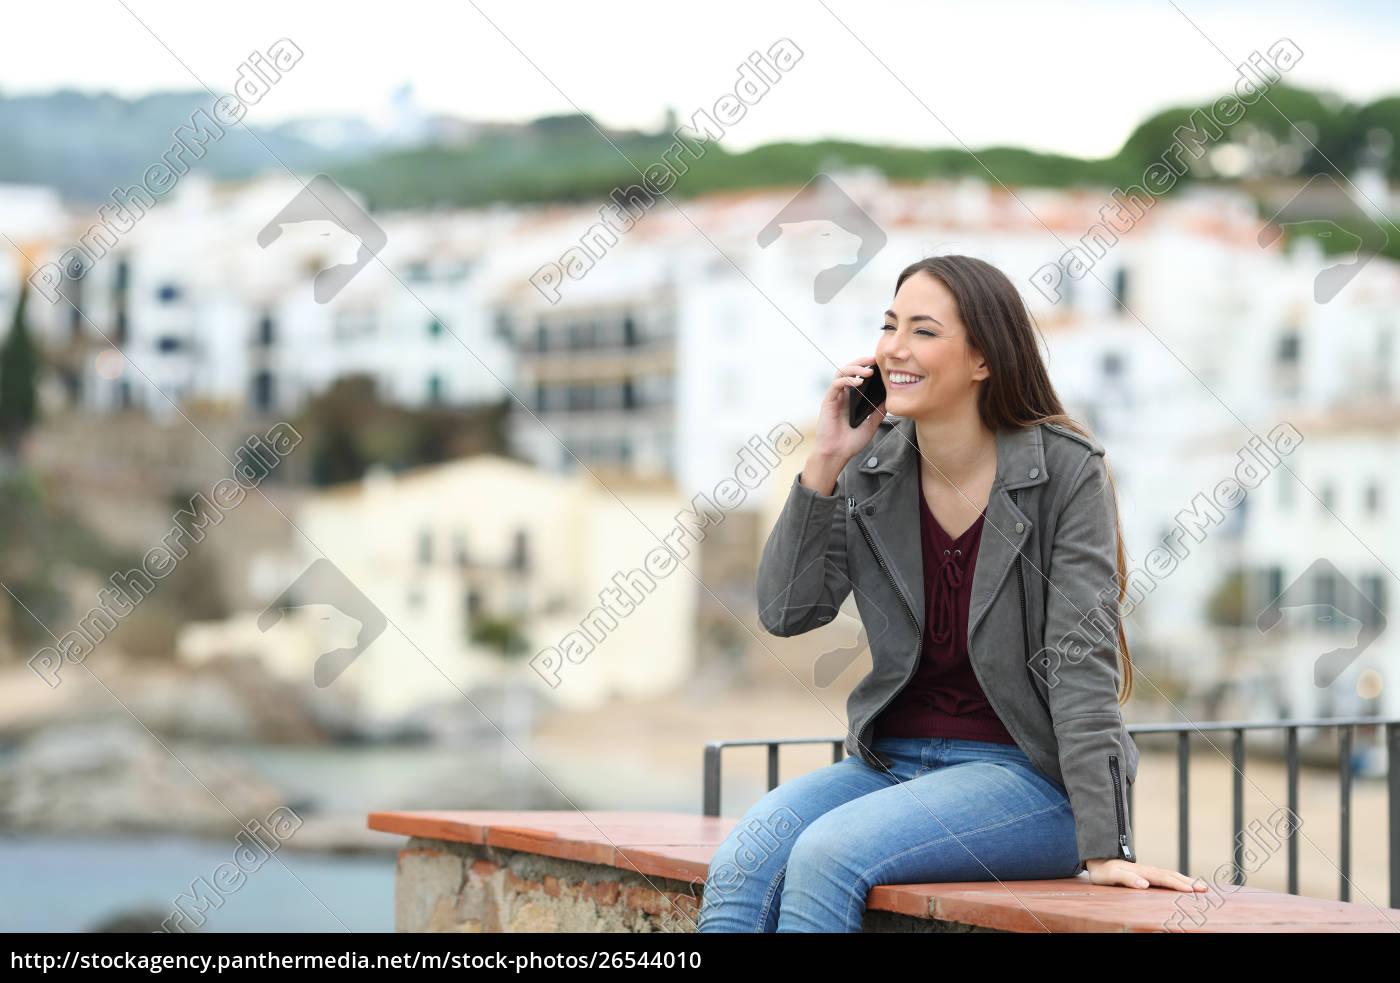 happy, woman, talking, on, phone, on - 26544010